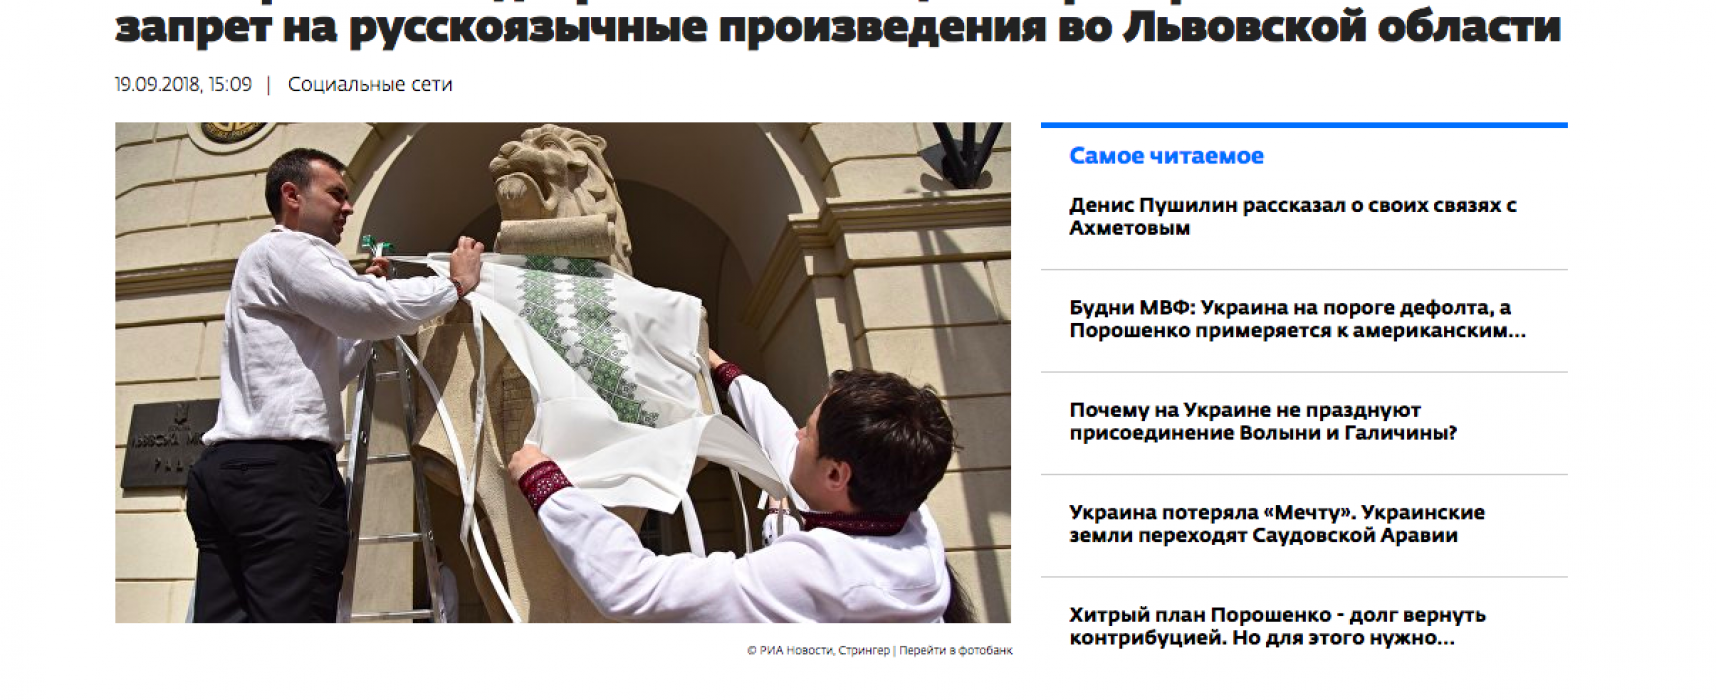 Falso: En la ciudad ucraniana de Lviv prohíben la lengua rusa